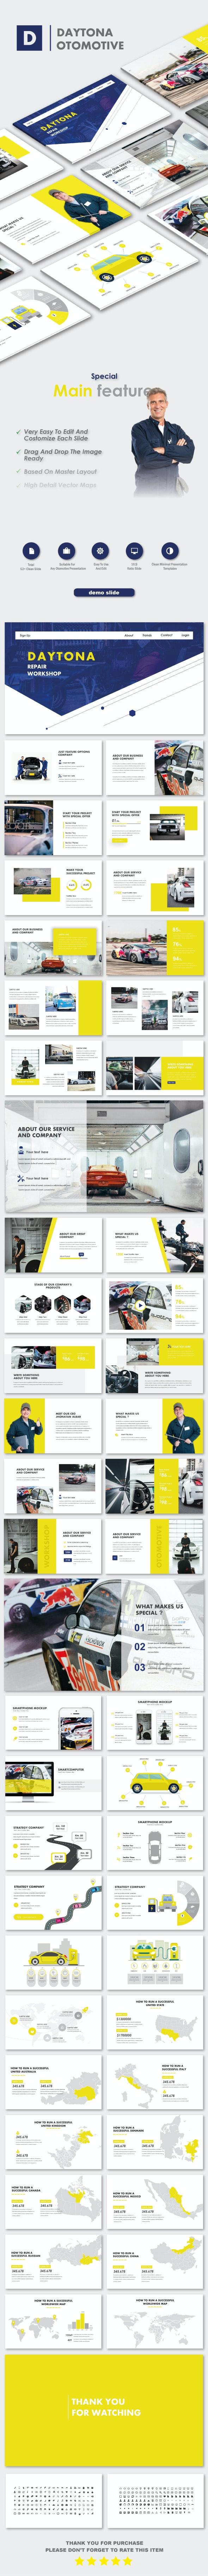 Daytona Otomotive Google Slide Templates - Miscellaneous PowerPoint Templates